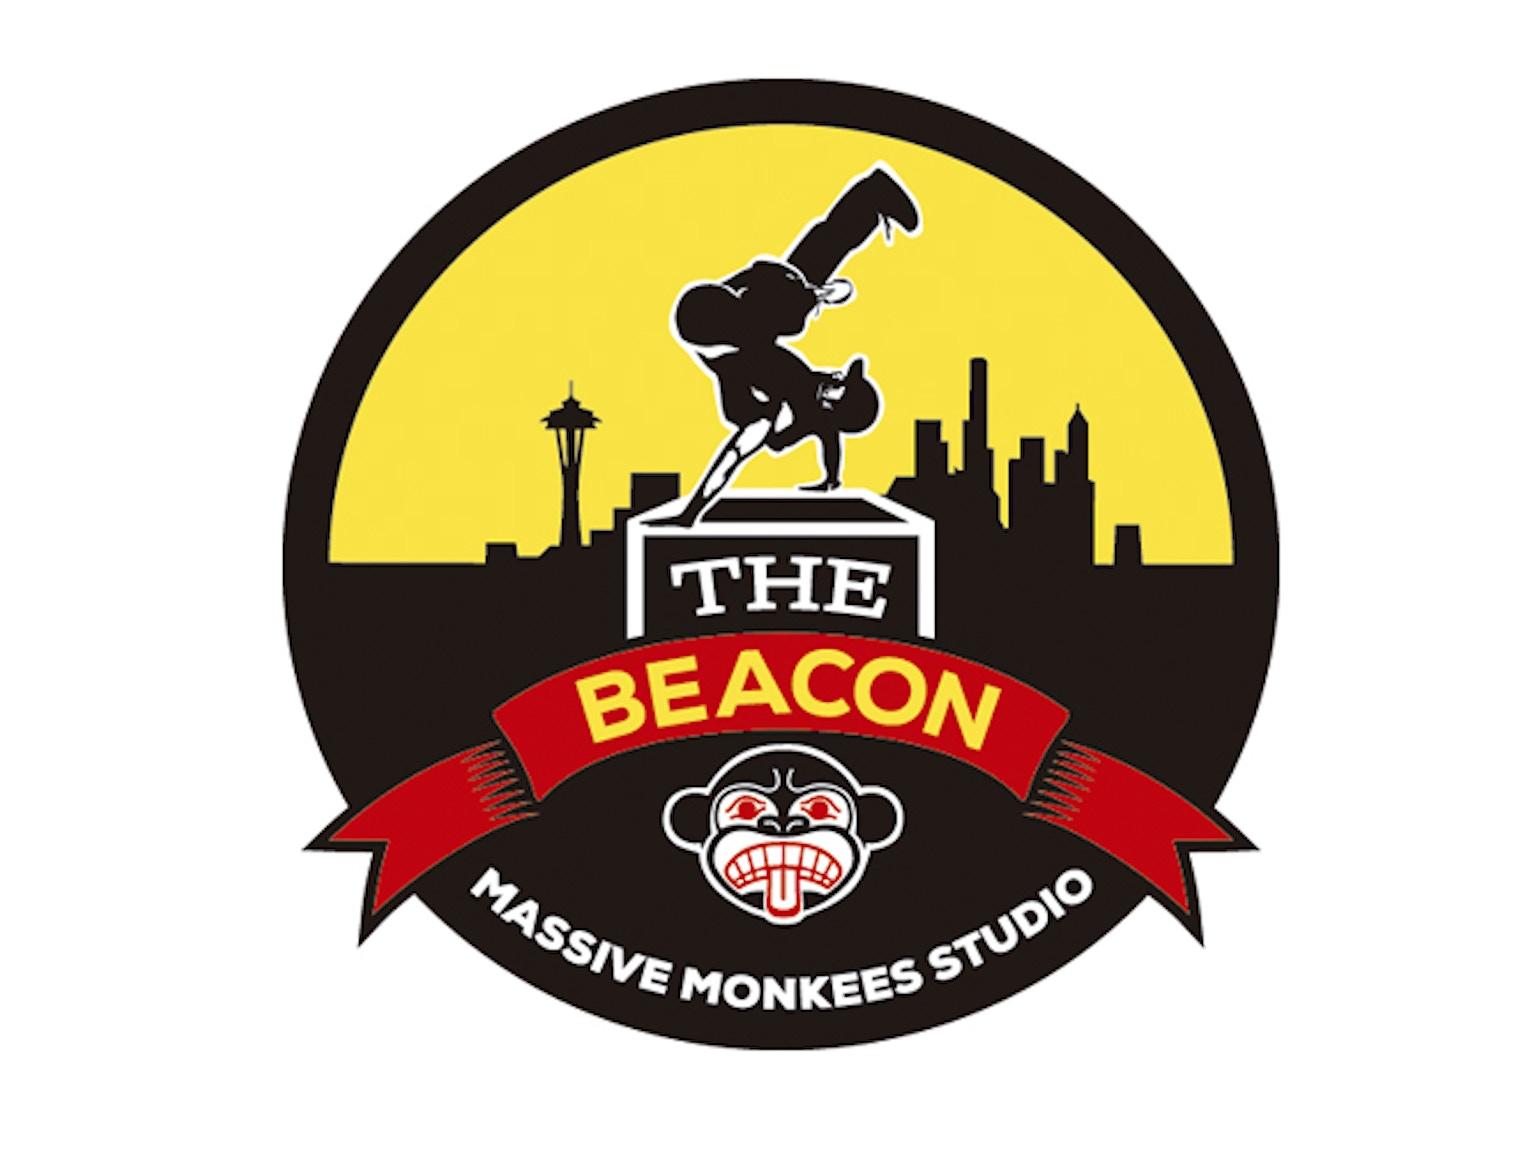 Massive Monkees Studio: The Beacon by Massive Monkees ...